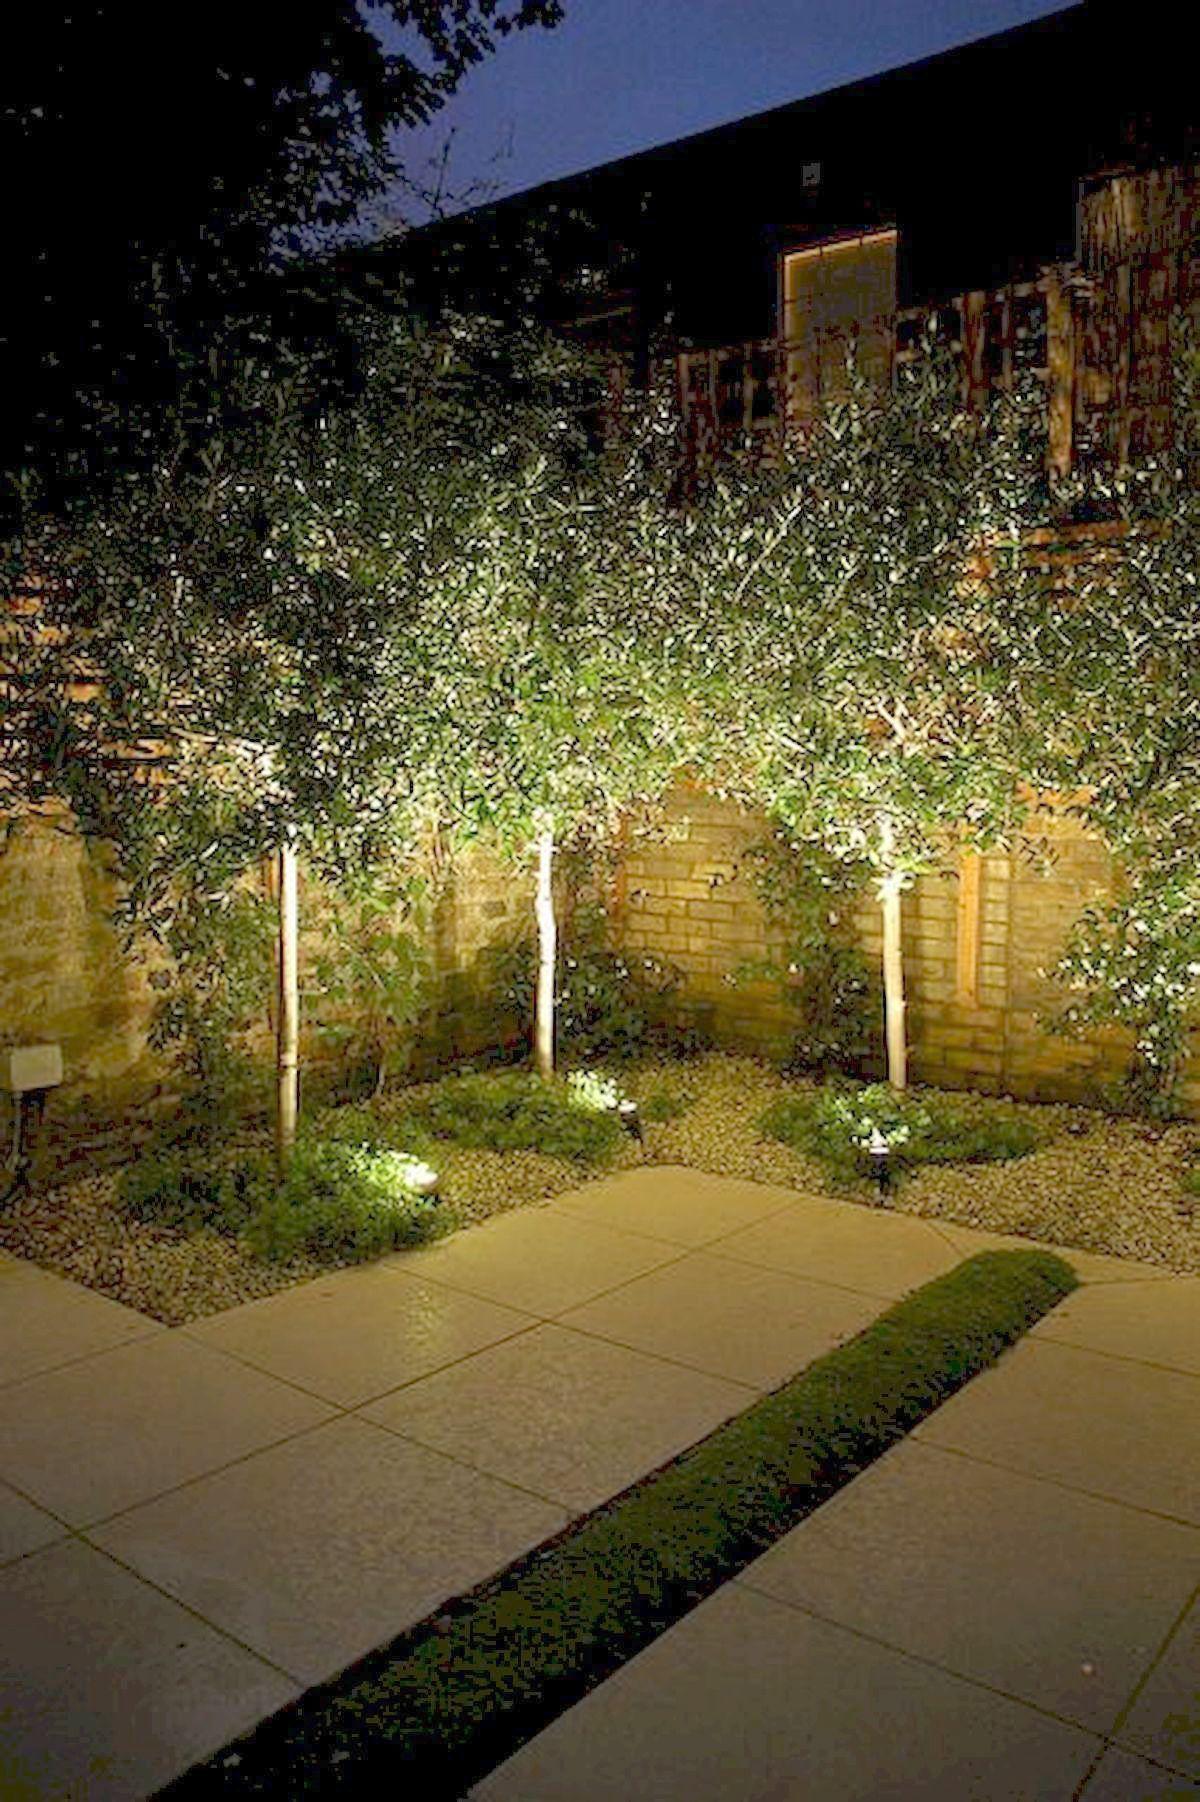 Landscape Gardening Courses Sydney A Garden Security Lighting Ideas Garden Lighting Design Landscape Lighting Design Modern Garden Lighting